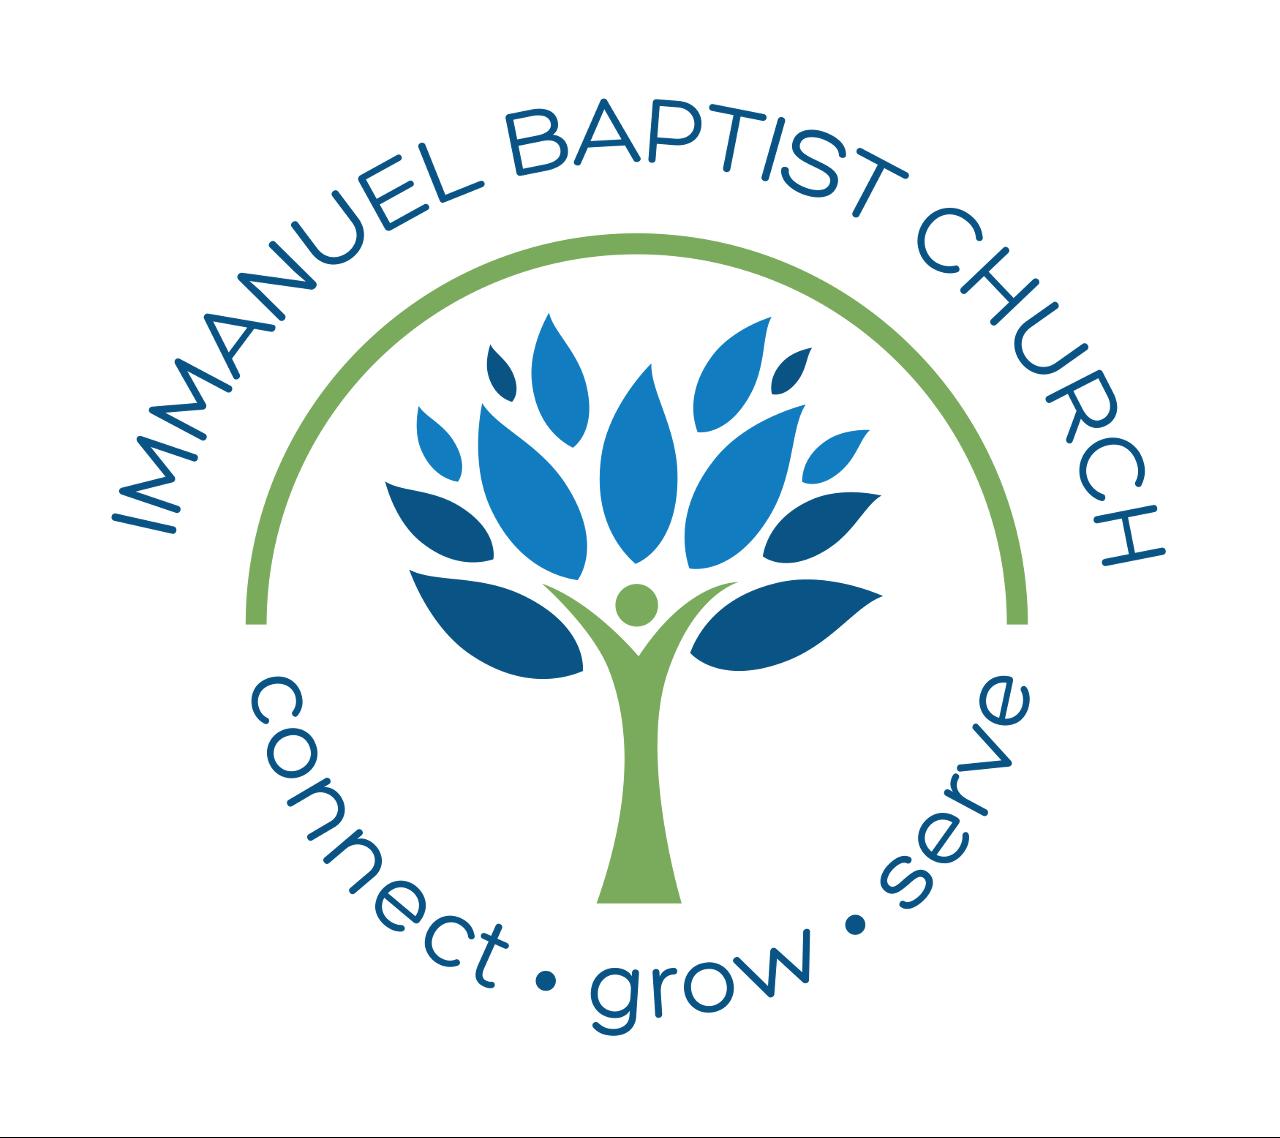 Ibc logo round 1280